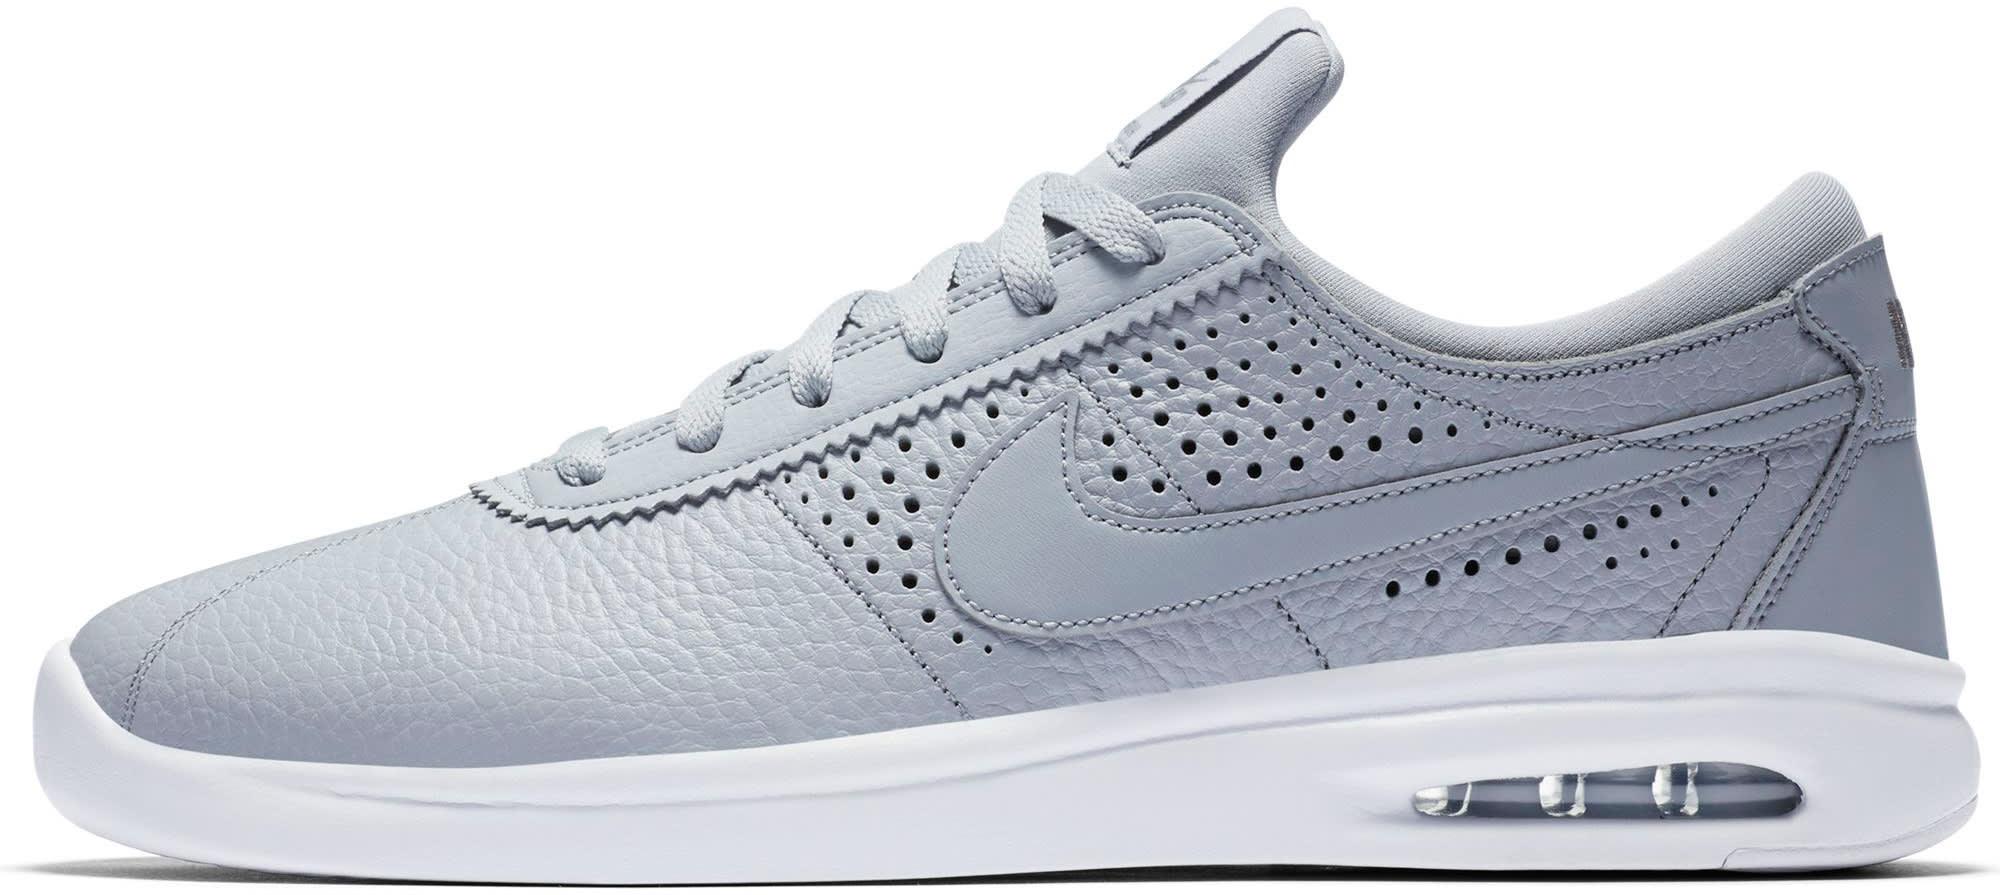 92bab2bf3ab Nike SB Air Max Bruin Vapor Leather Skate Shoes - thumbnail 2